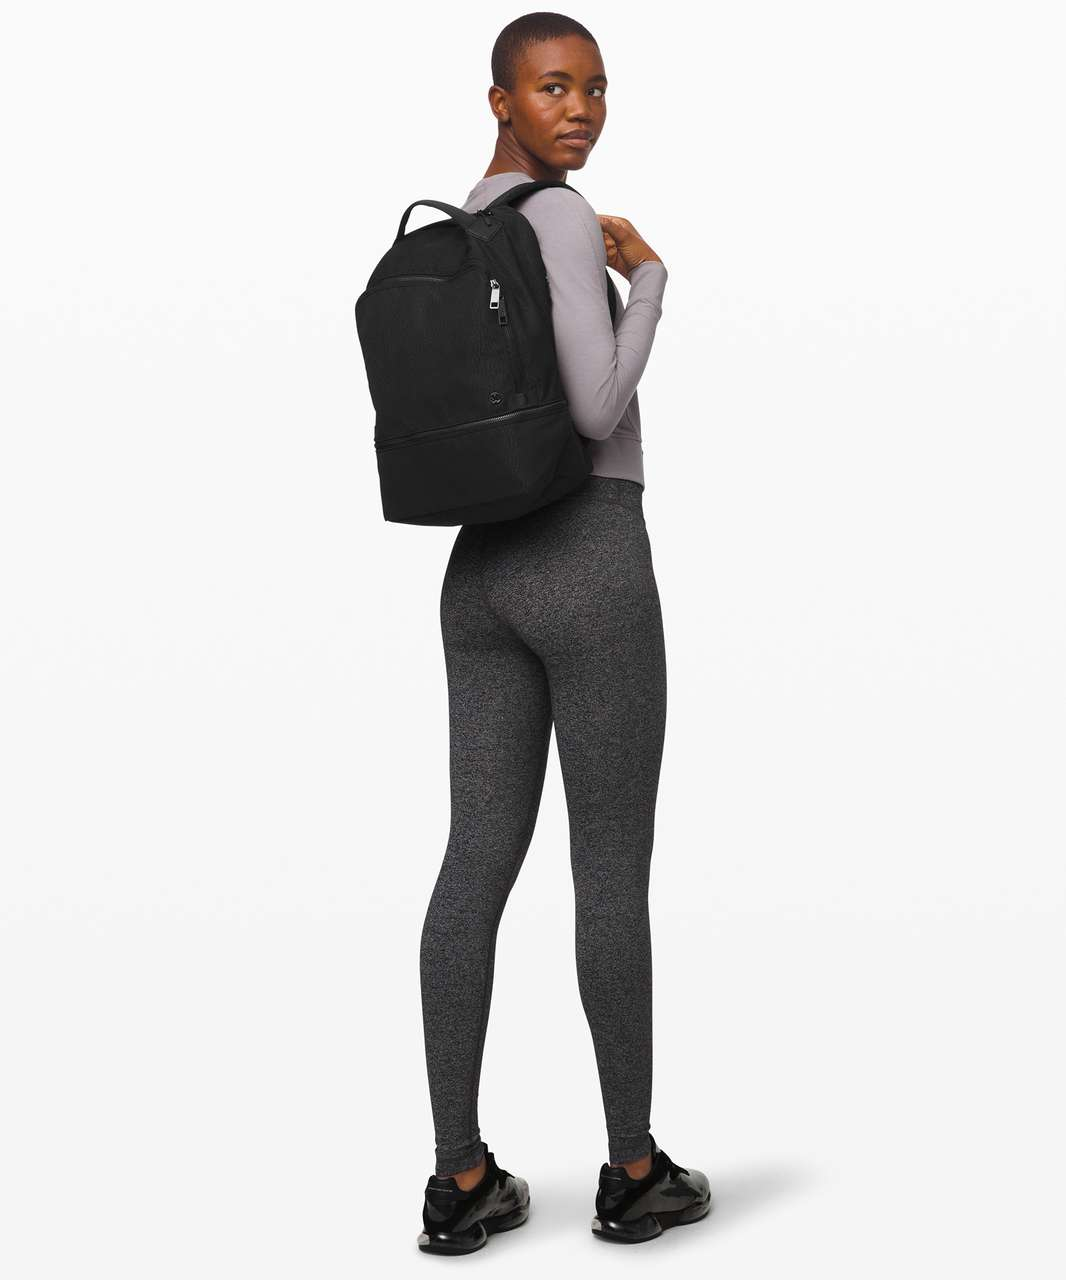 Lululemon City Adventurer Backpack *17L - Stacked Jacquard Black Midnight